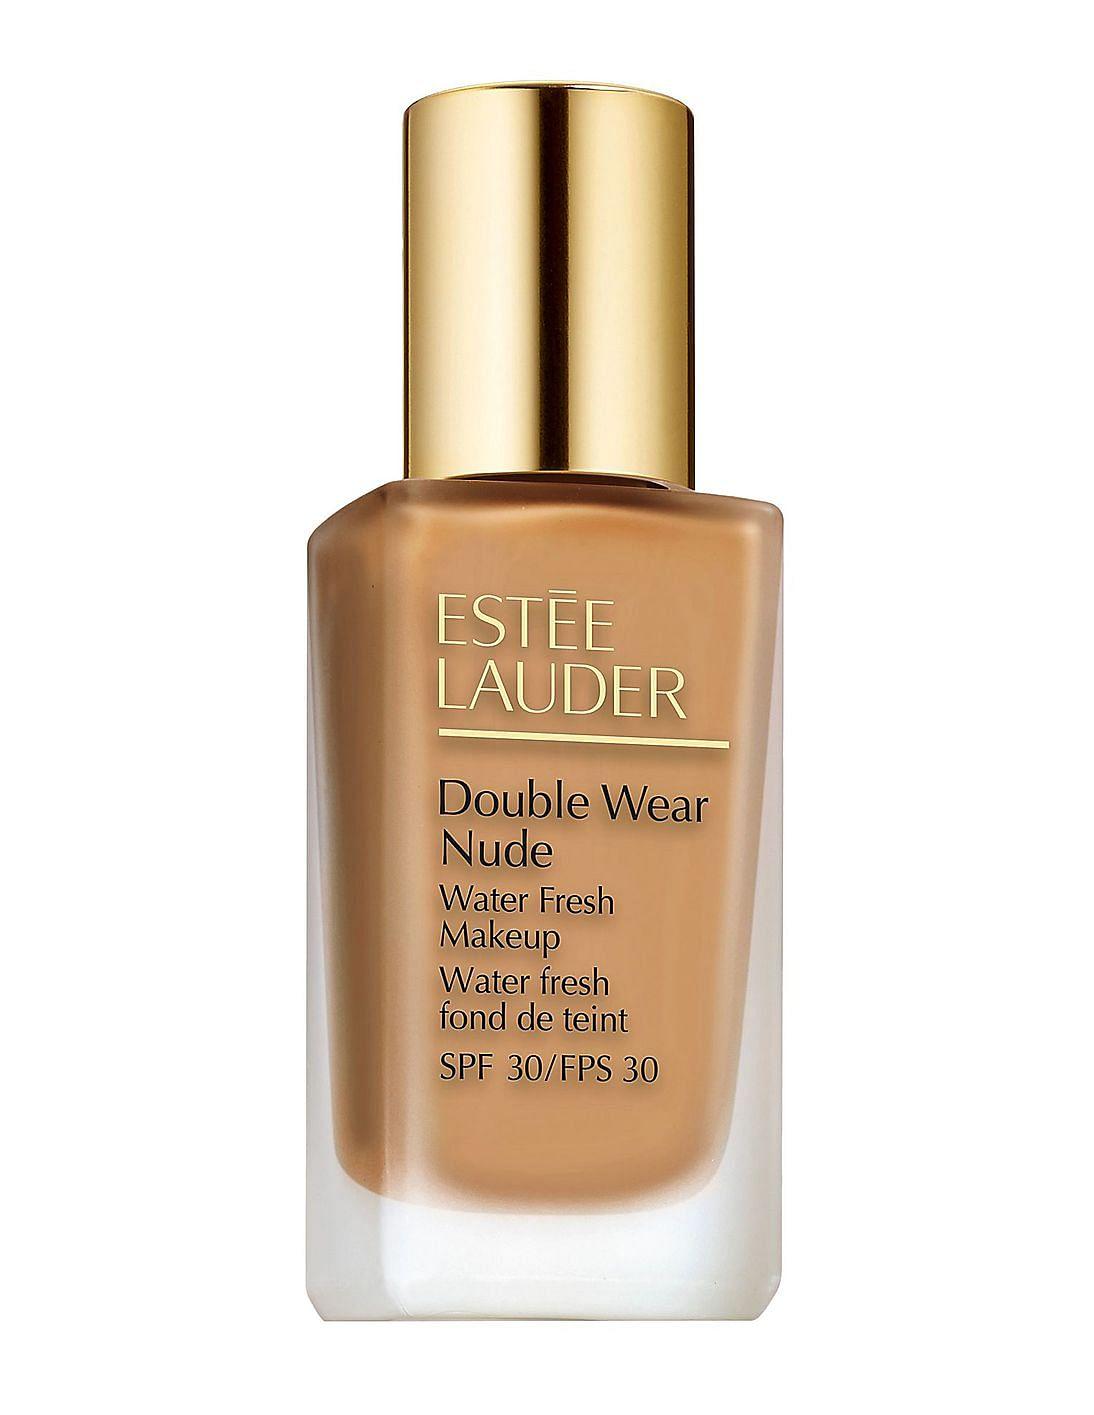 Estee lauder double wear nude water fresh makeup 2w1 30 ml